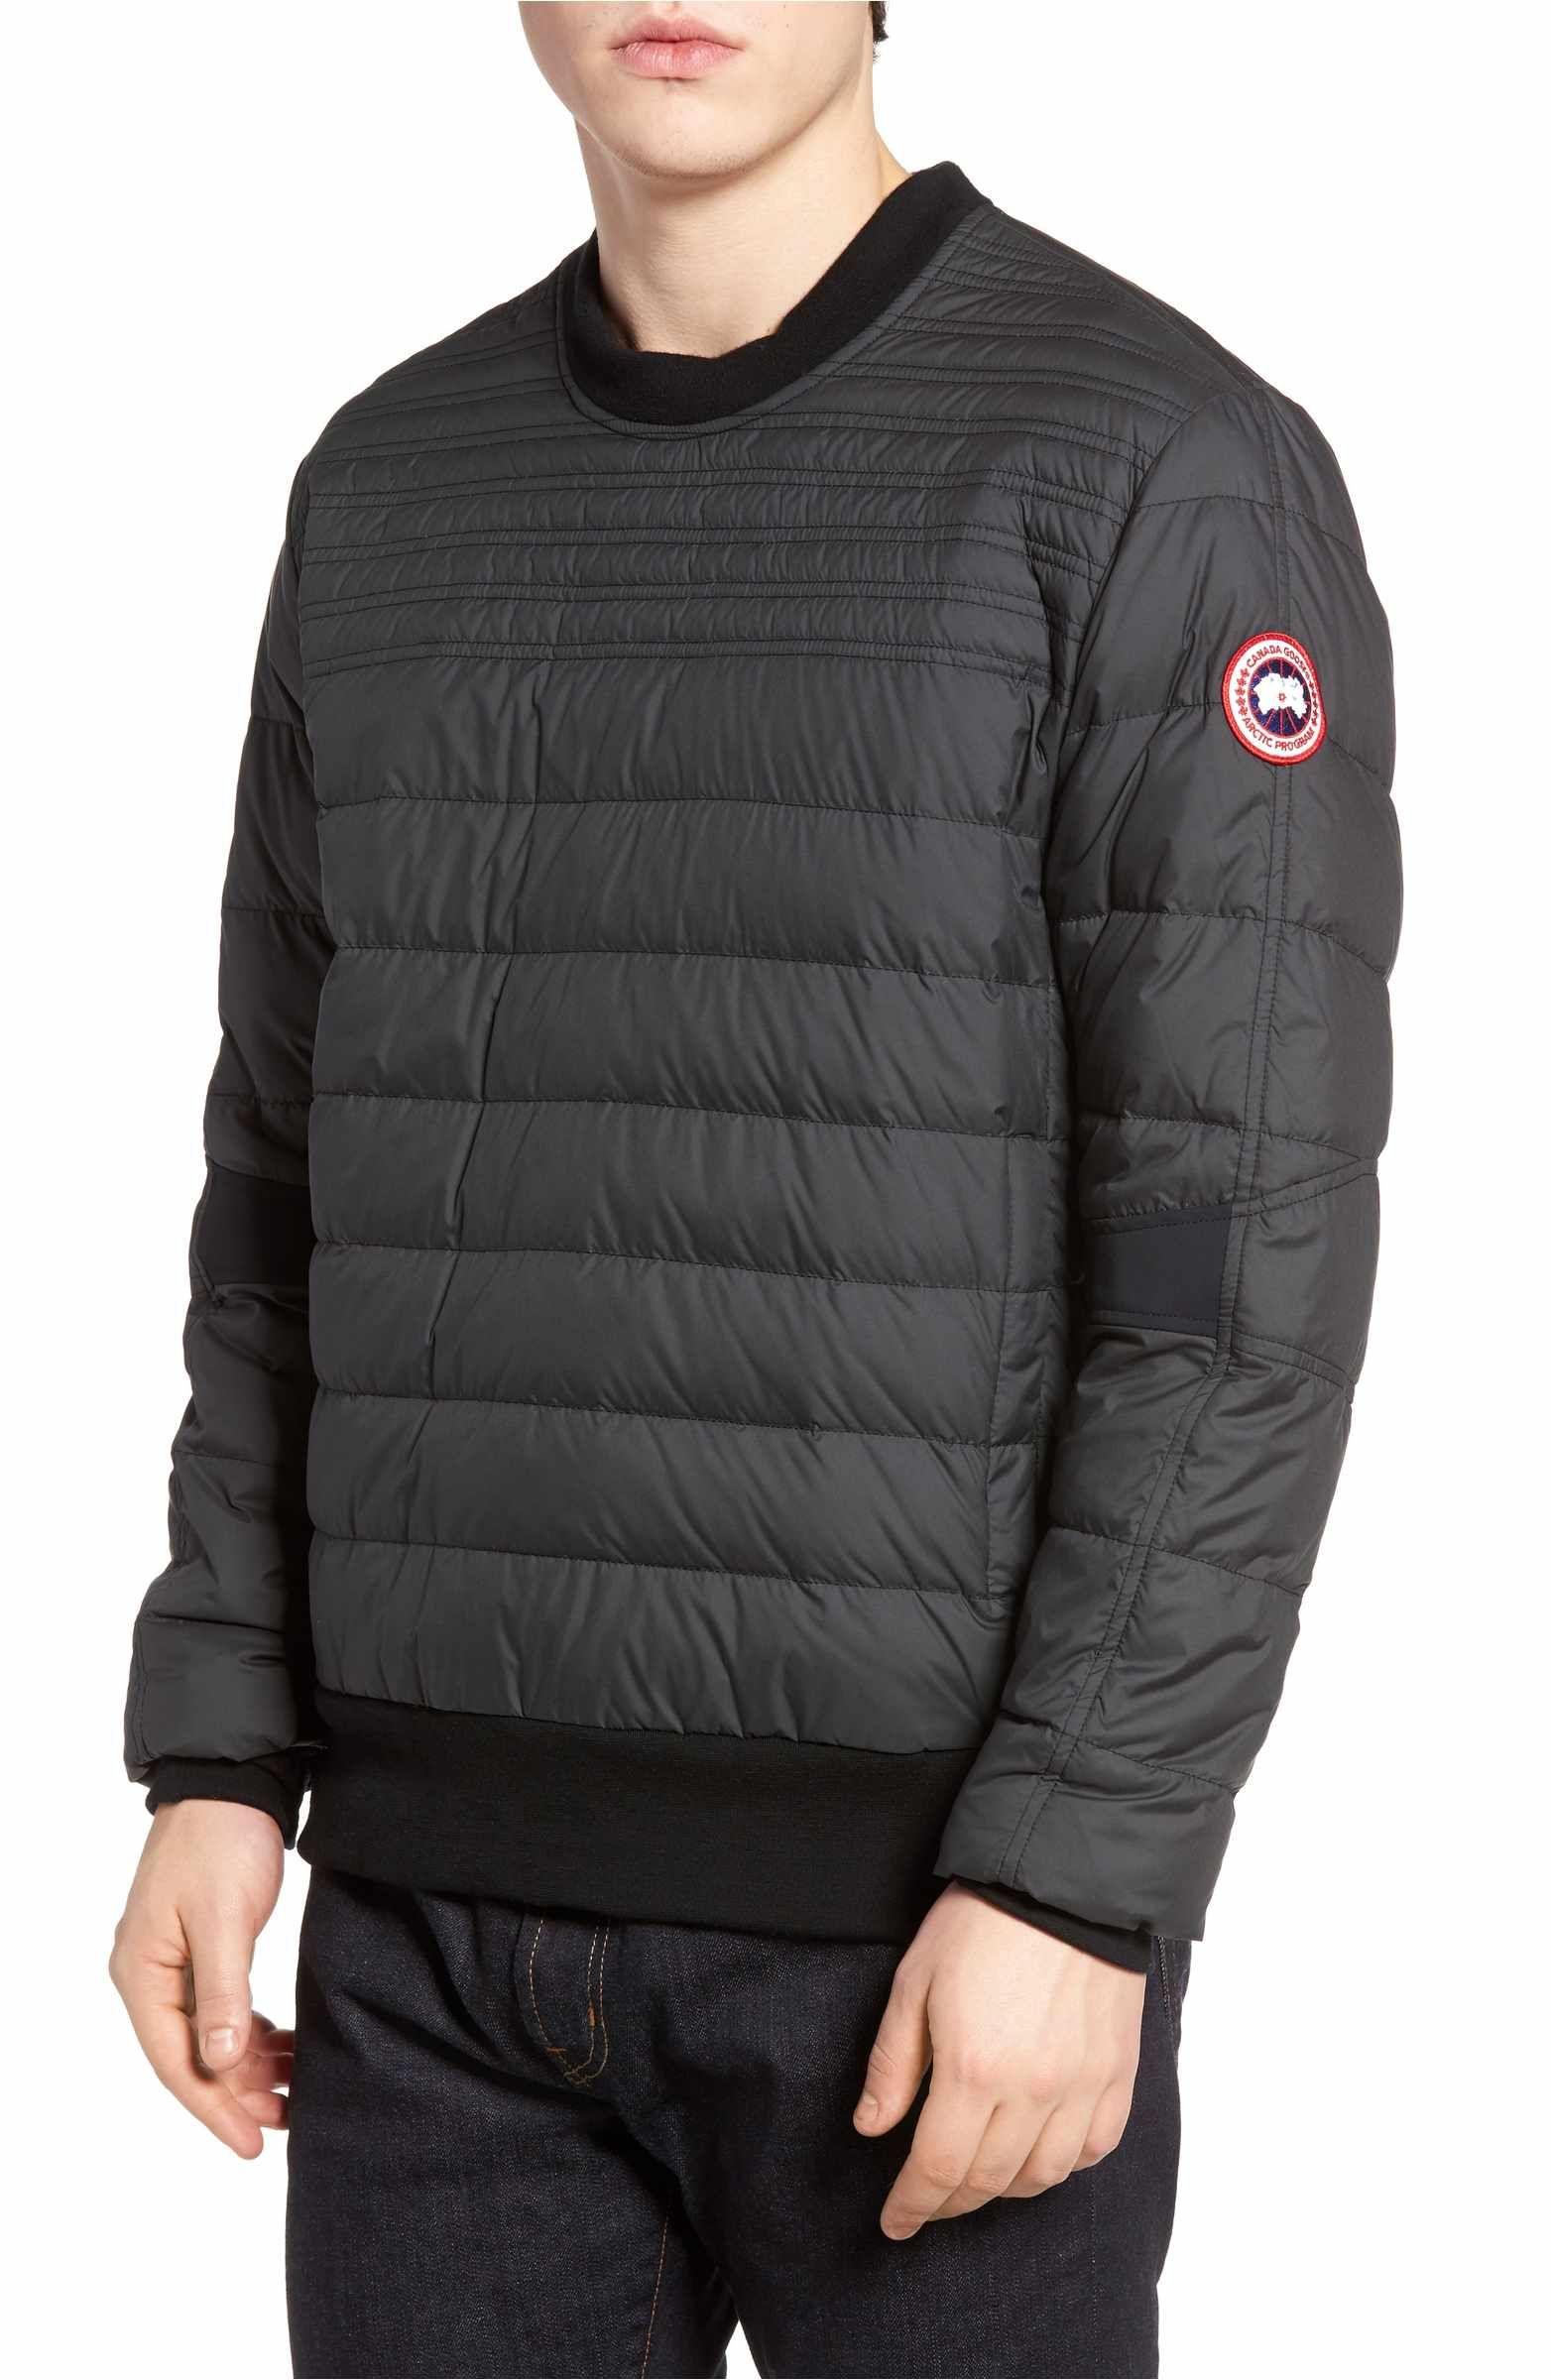 Canada Goose Albanny Regular Fit Water Resistant Down Shirt Nordstrom Mens Sweatshirts Hoodie Mens Outfits Hoodies Men